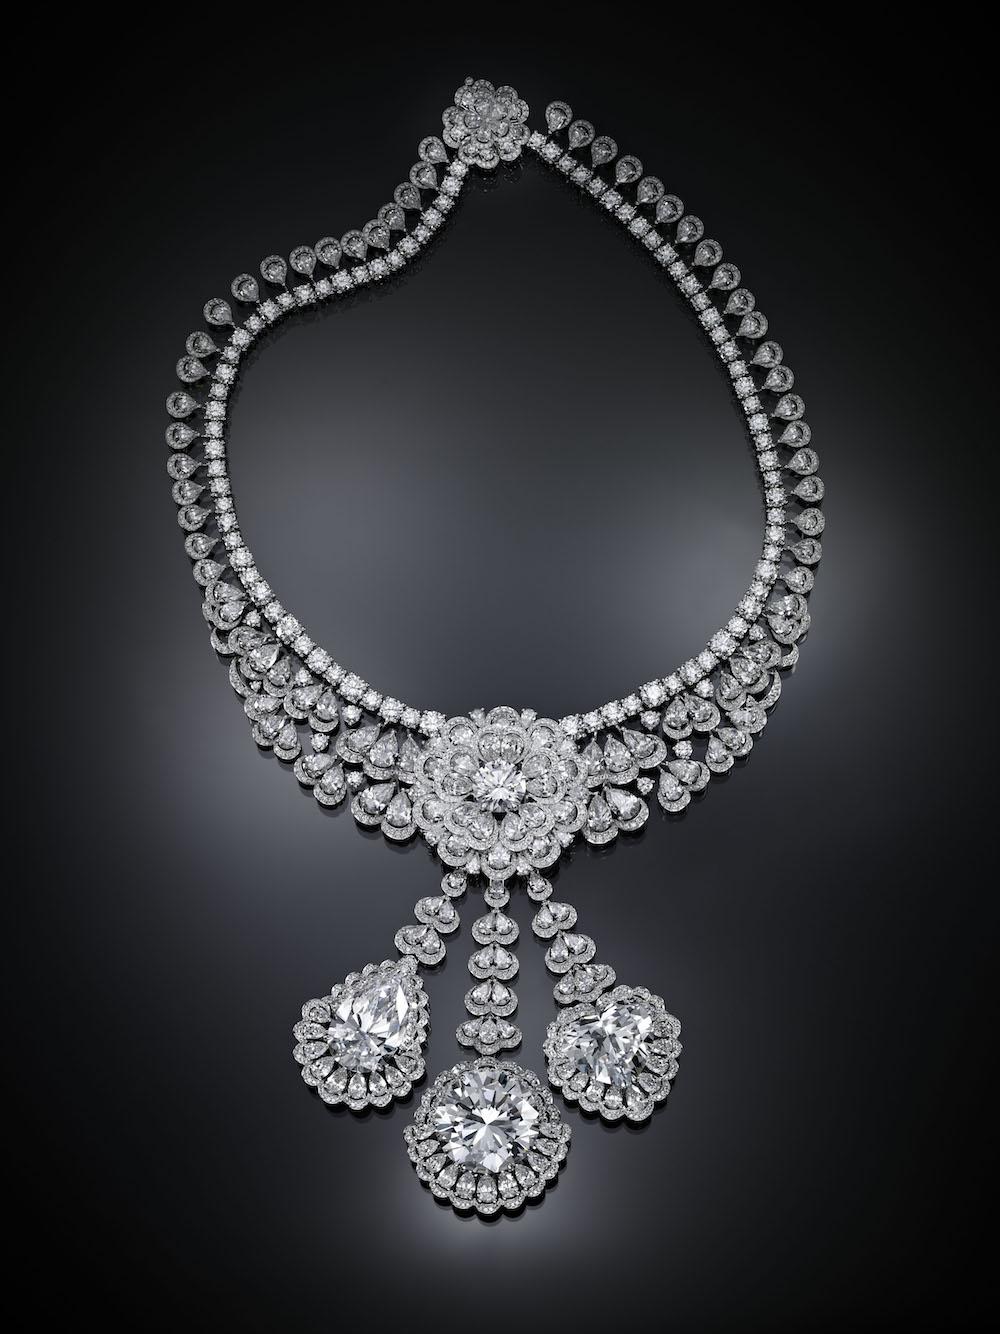 Chopard, Queen of Kalhahari, collier